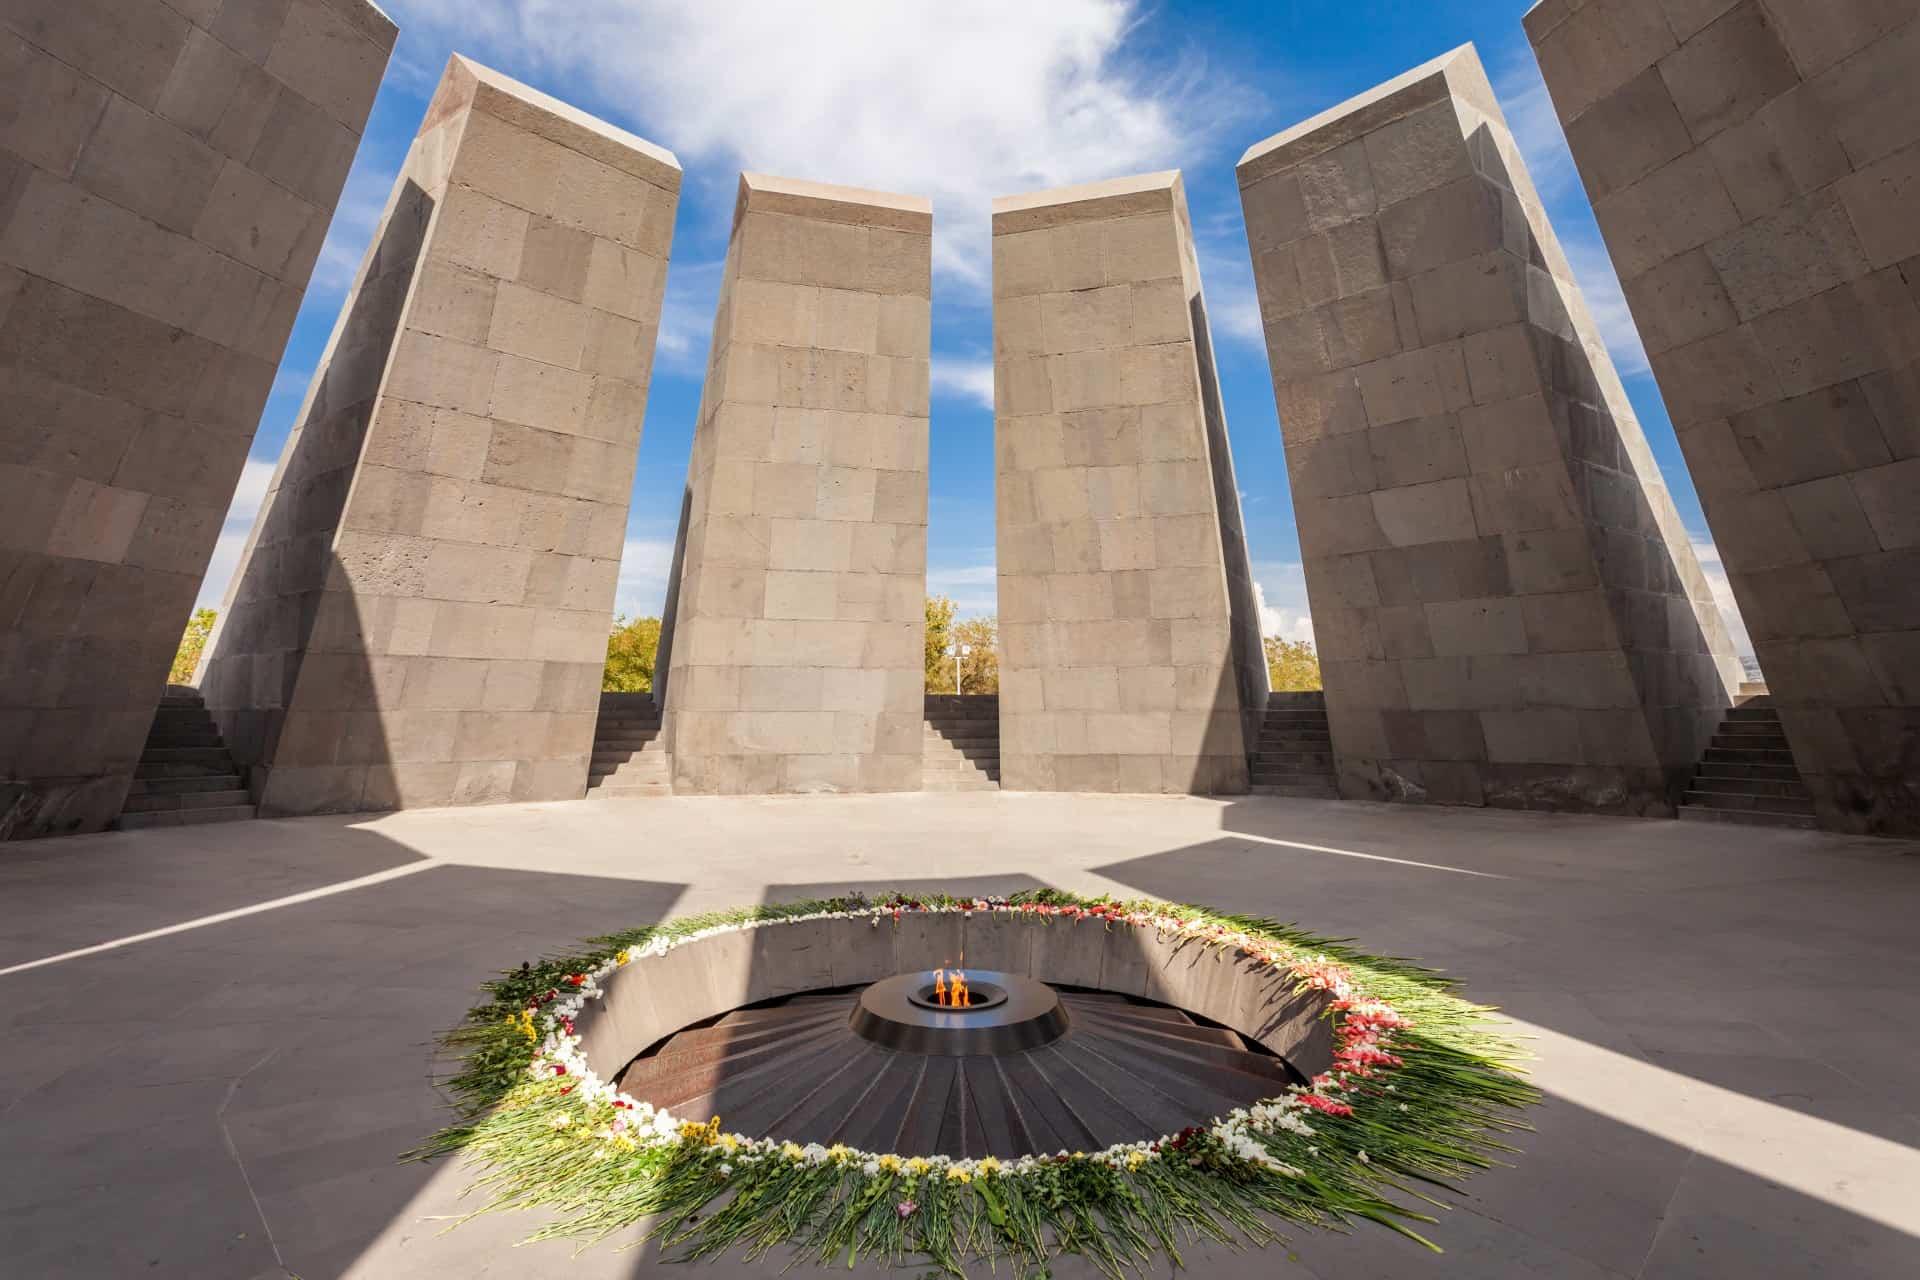 Tsitsernakaberd Memorial Complex, Armenia